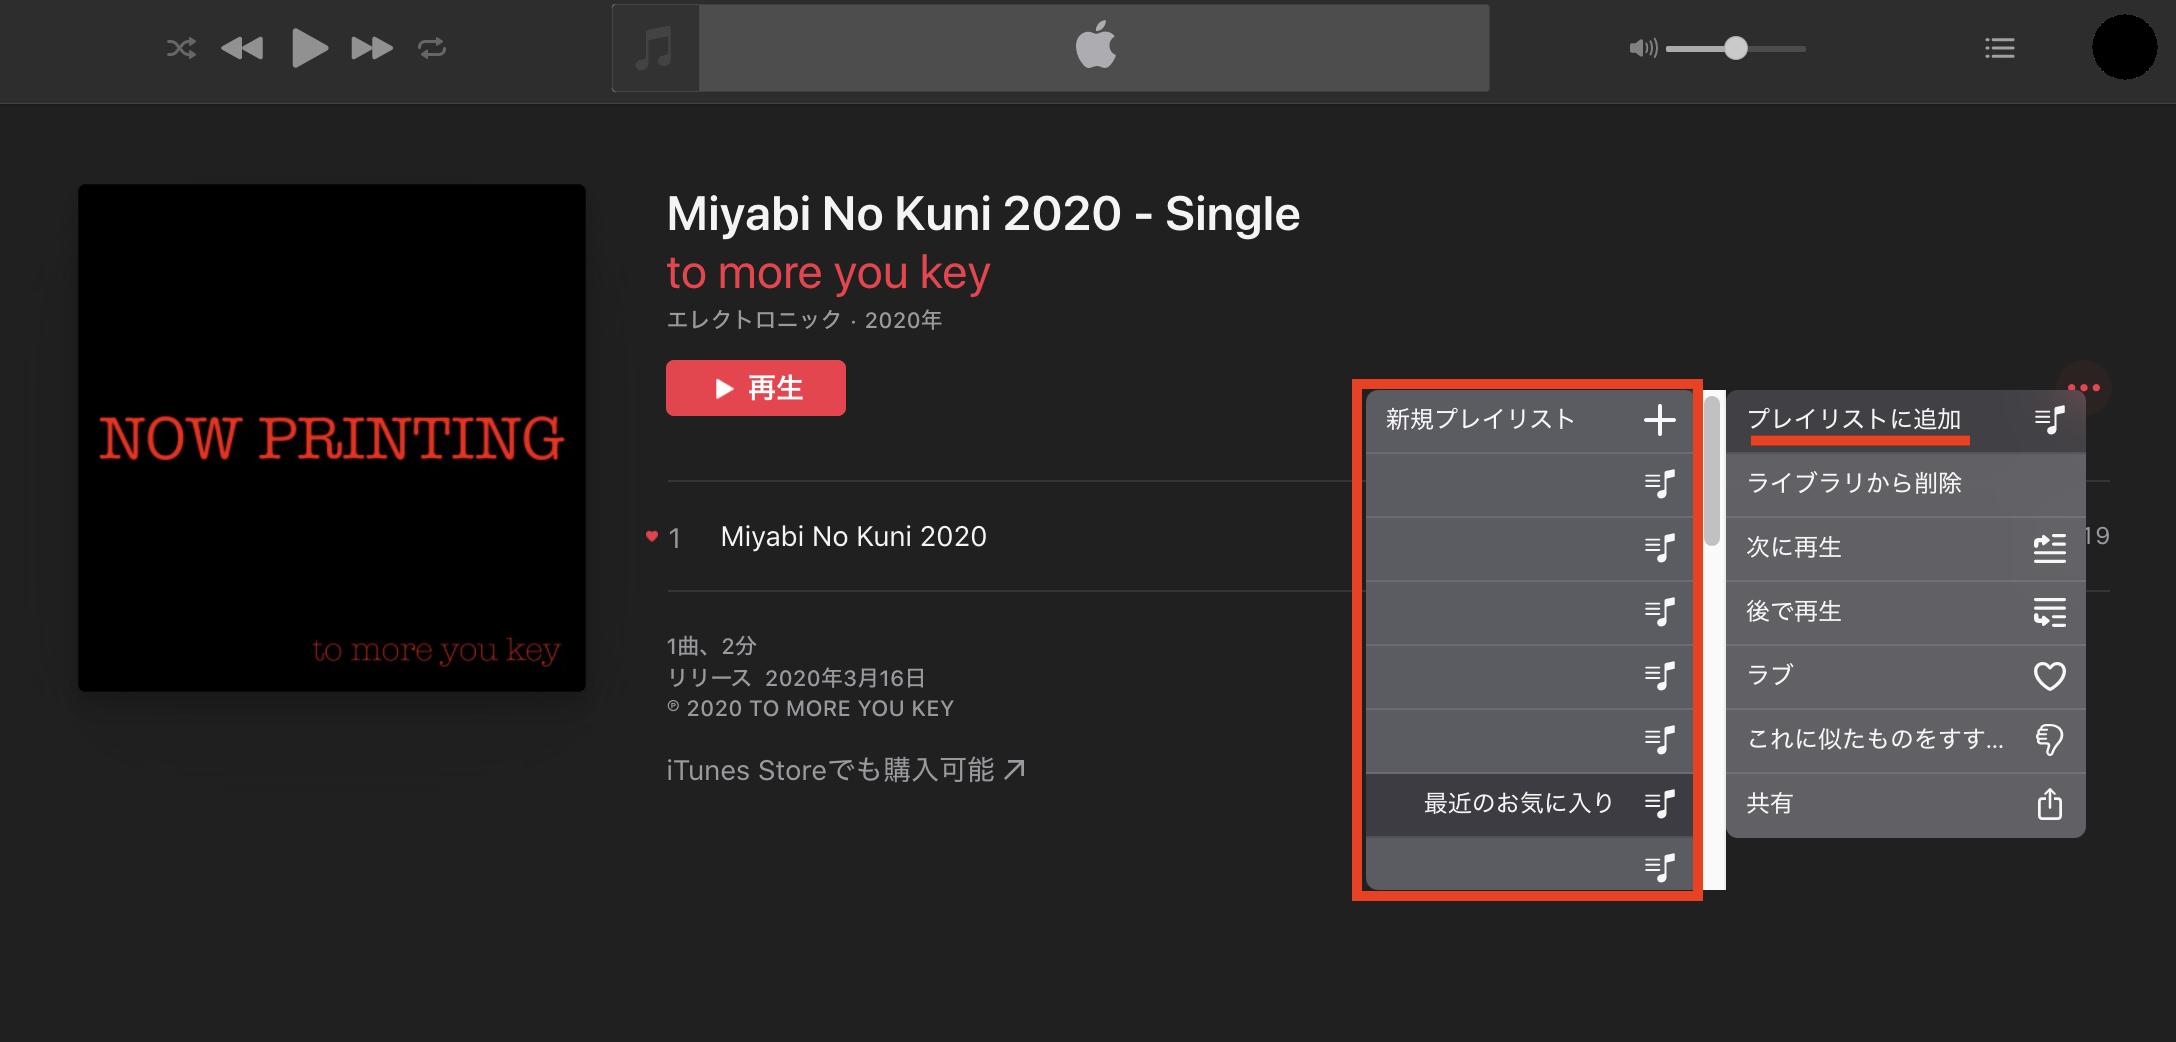 PC版 - AppleMusic & iTunes Music プレイリストへの楽曲追加方法|画像3